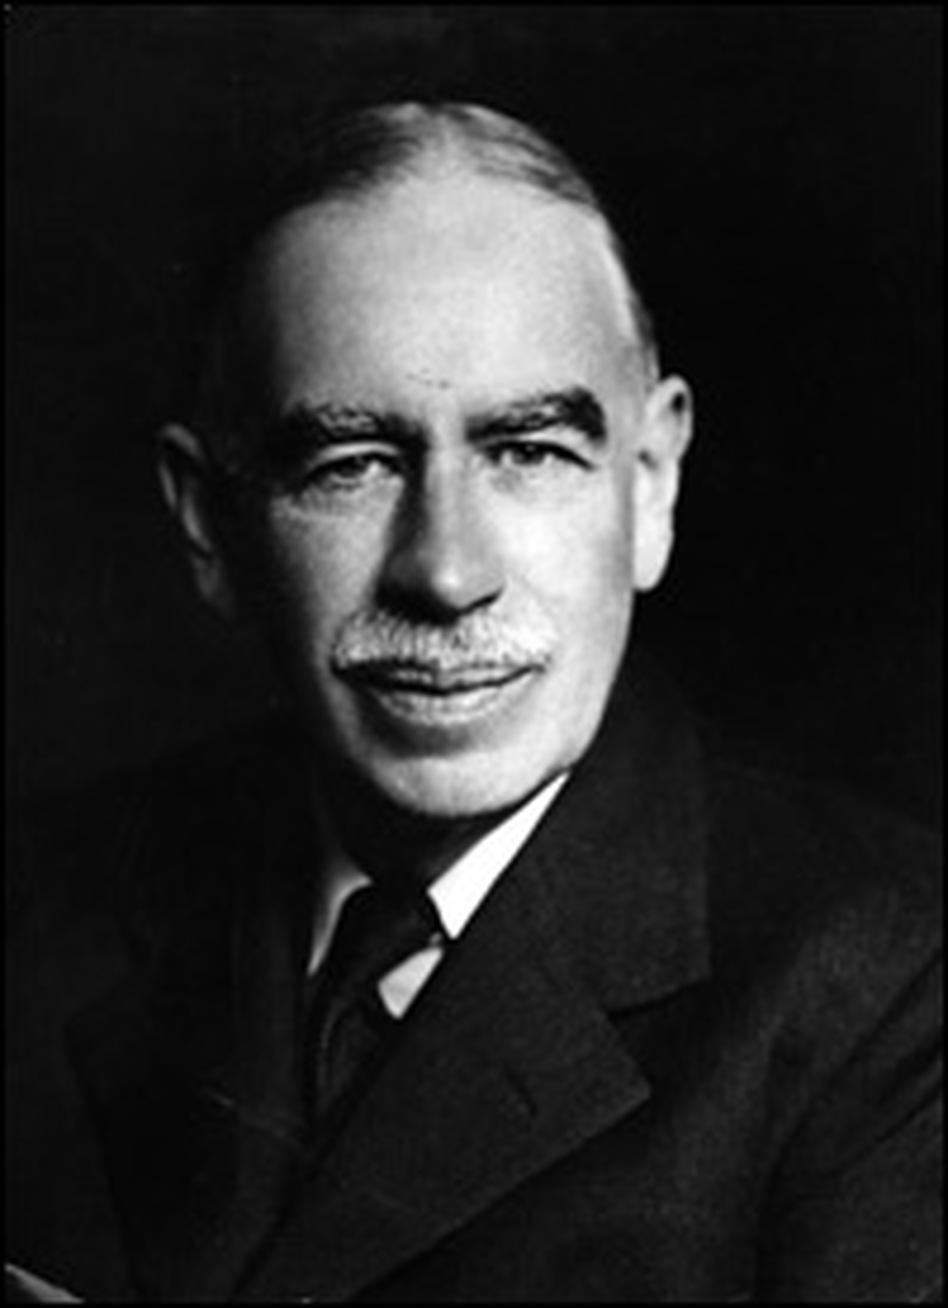 English economist John Maynard Keynes, seen here circa 1940, believed no one in America was smart enough to run it.